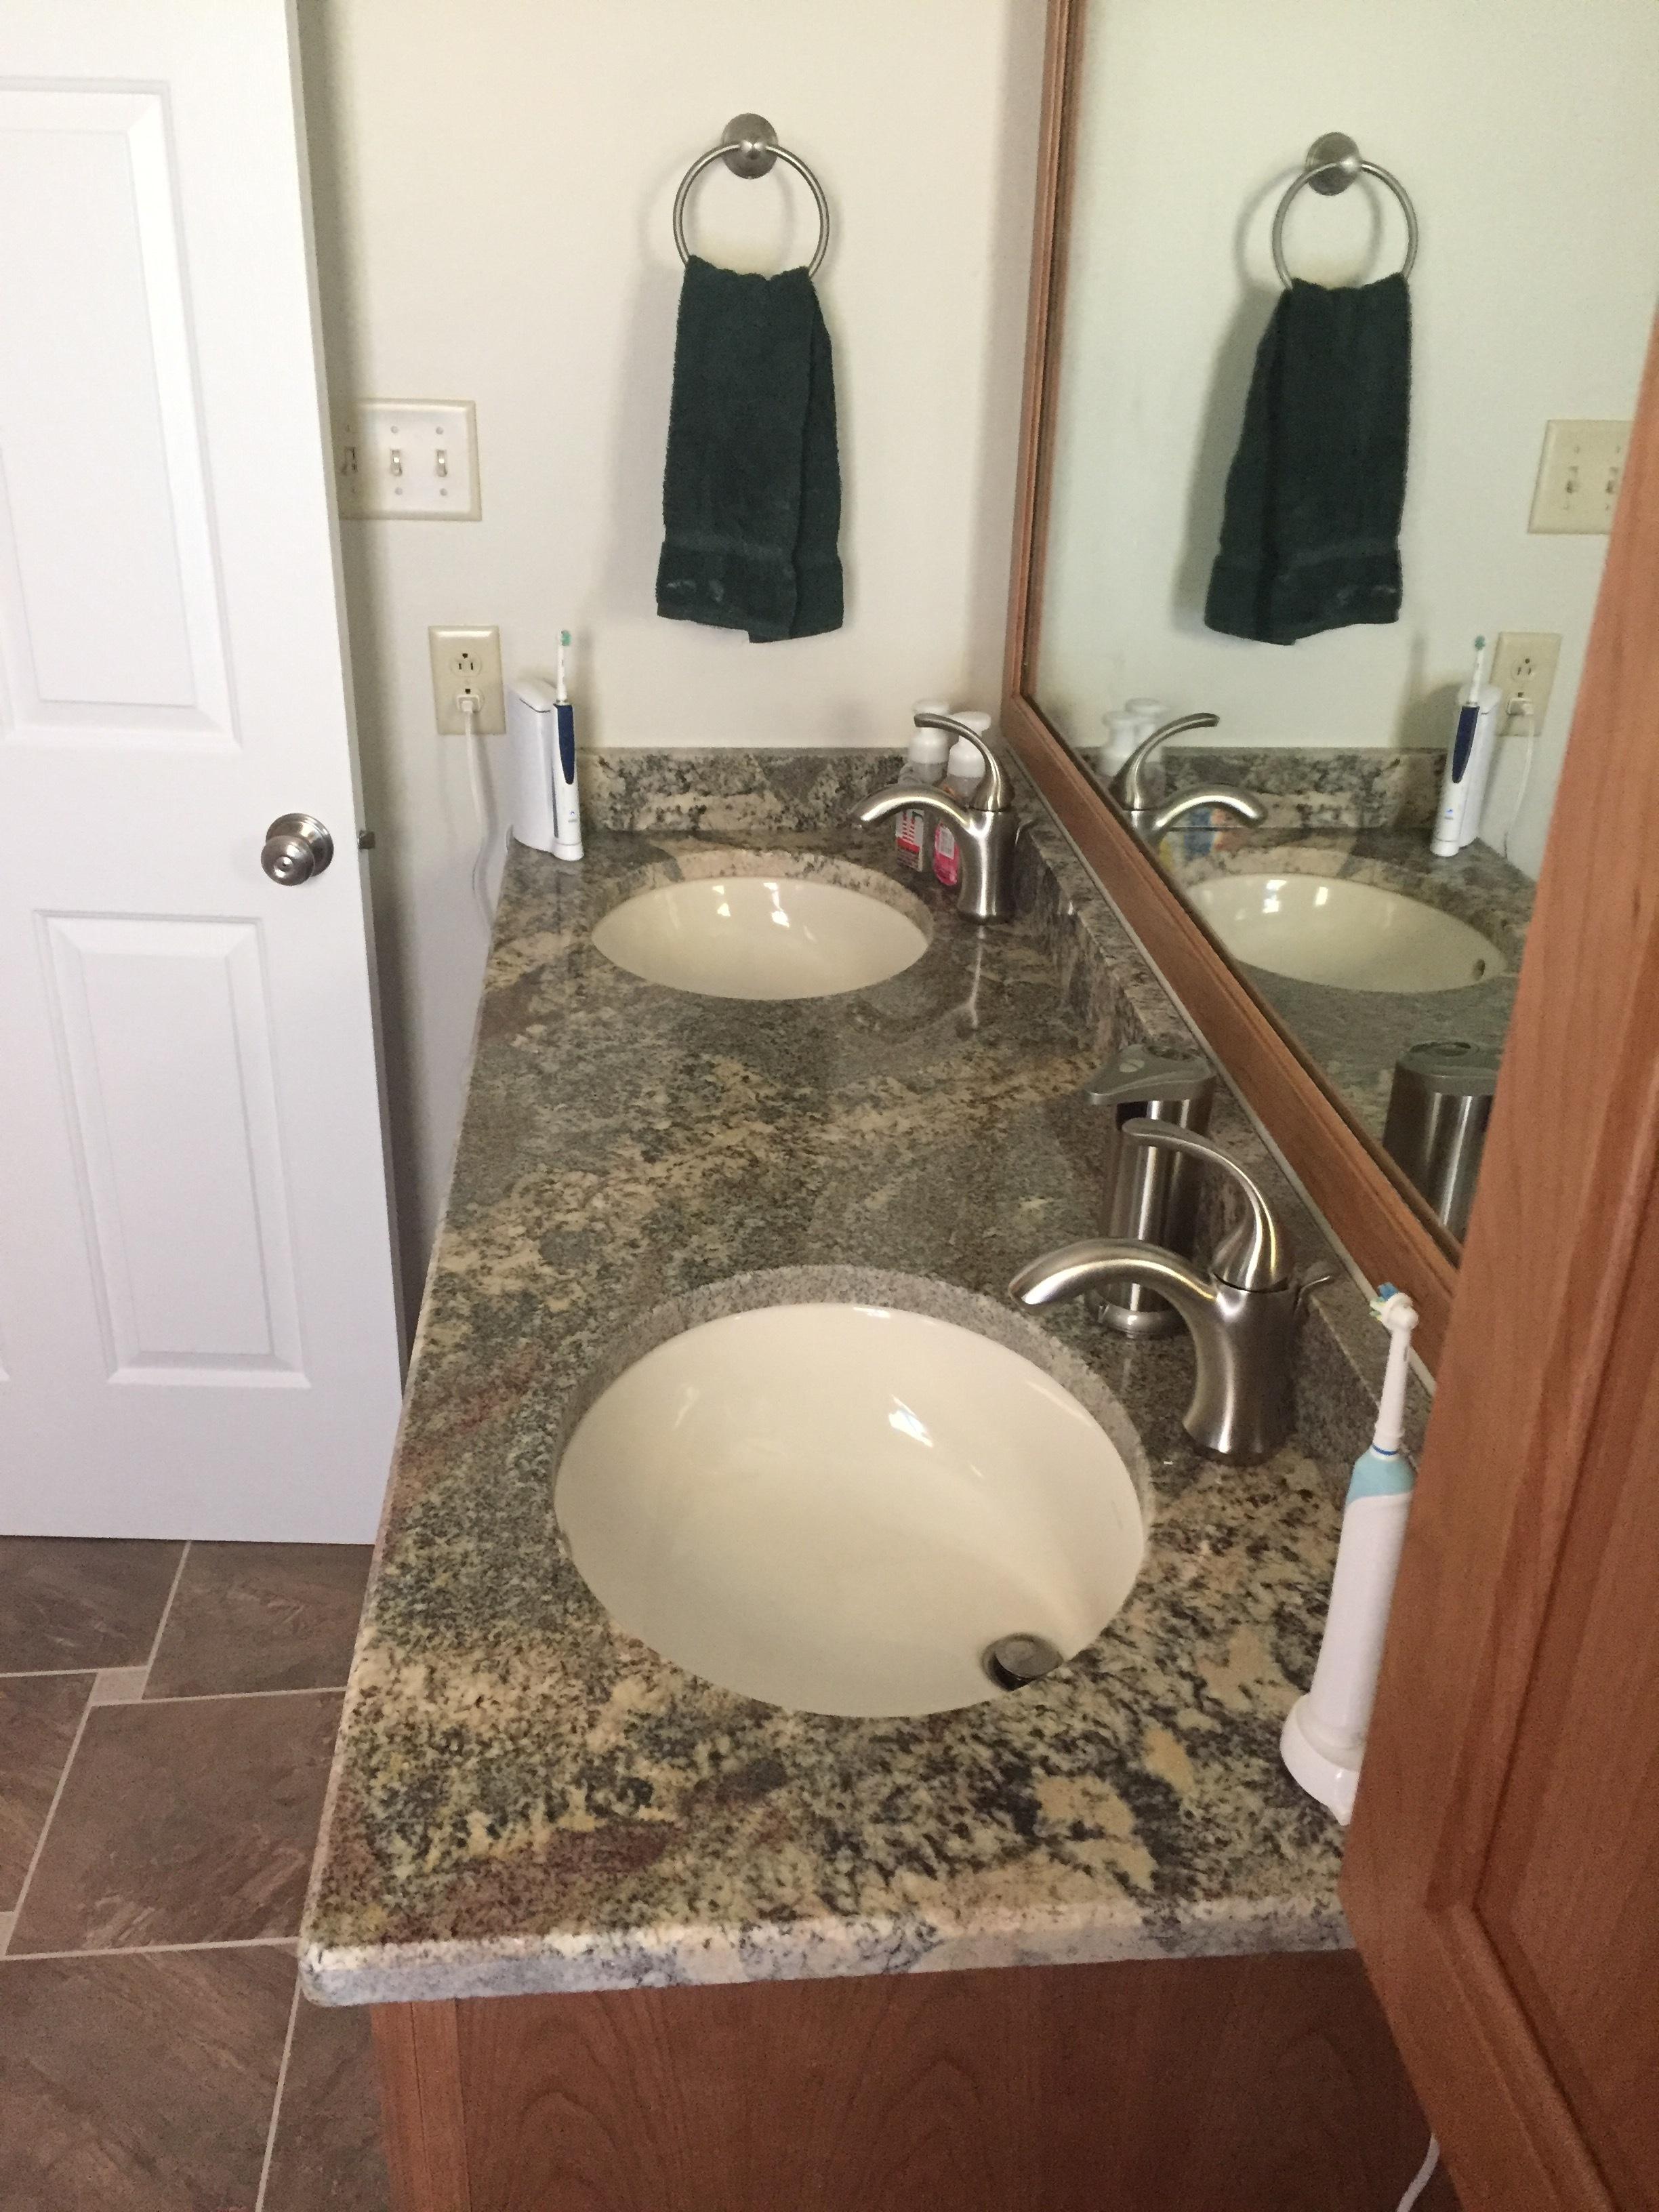 Sink -  After